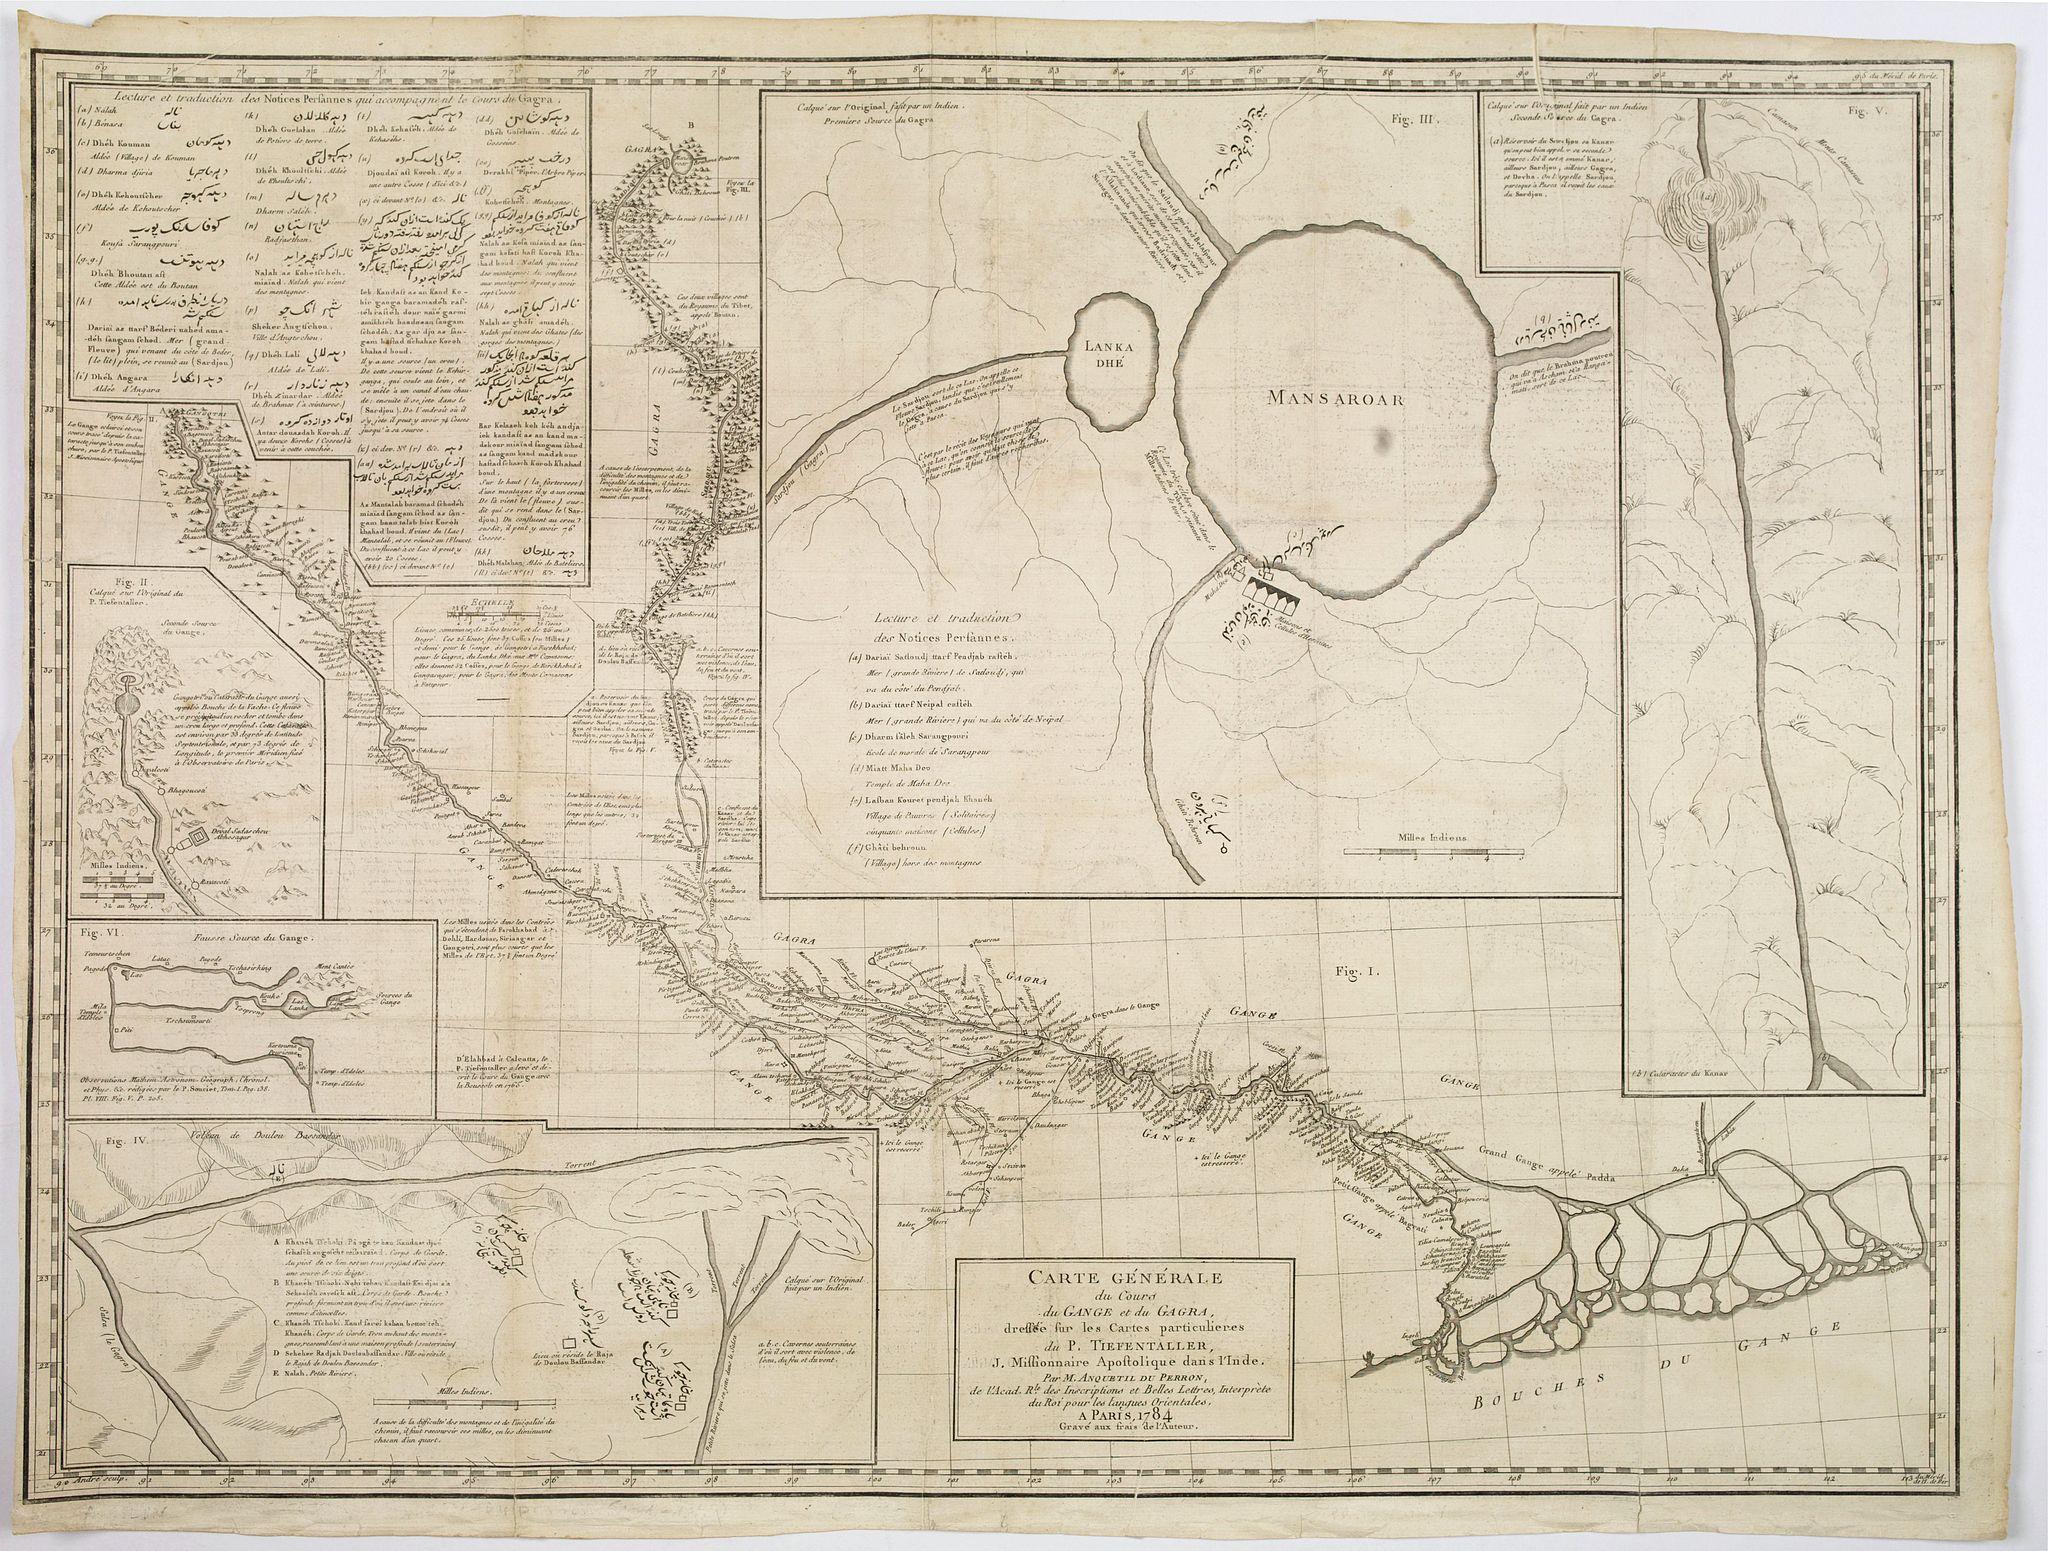 TIEFENTALLER, Joseph. -  Carte Generale du Cours du Gange et du Gagra. . .